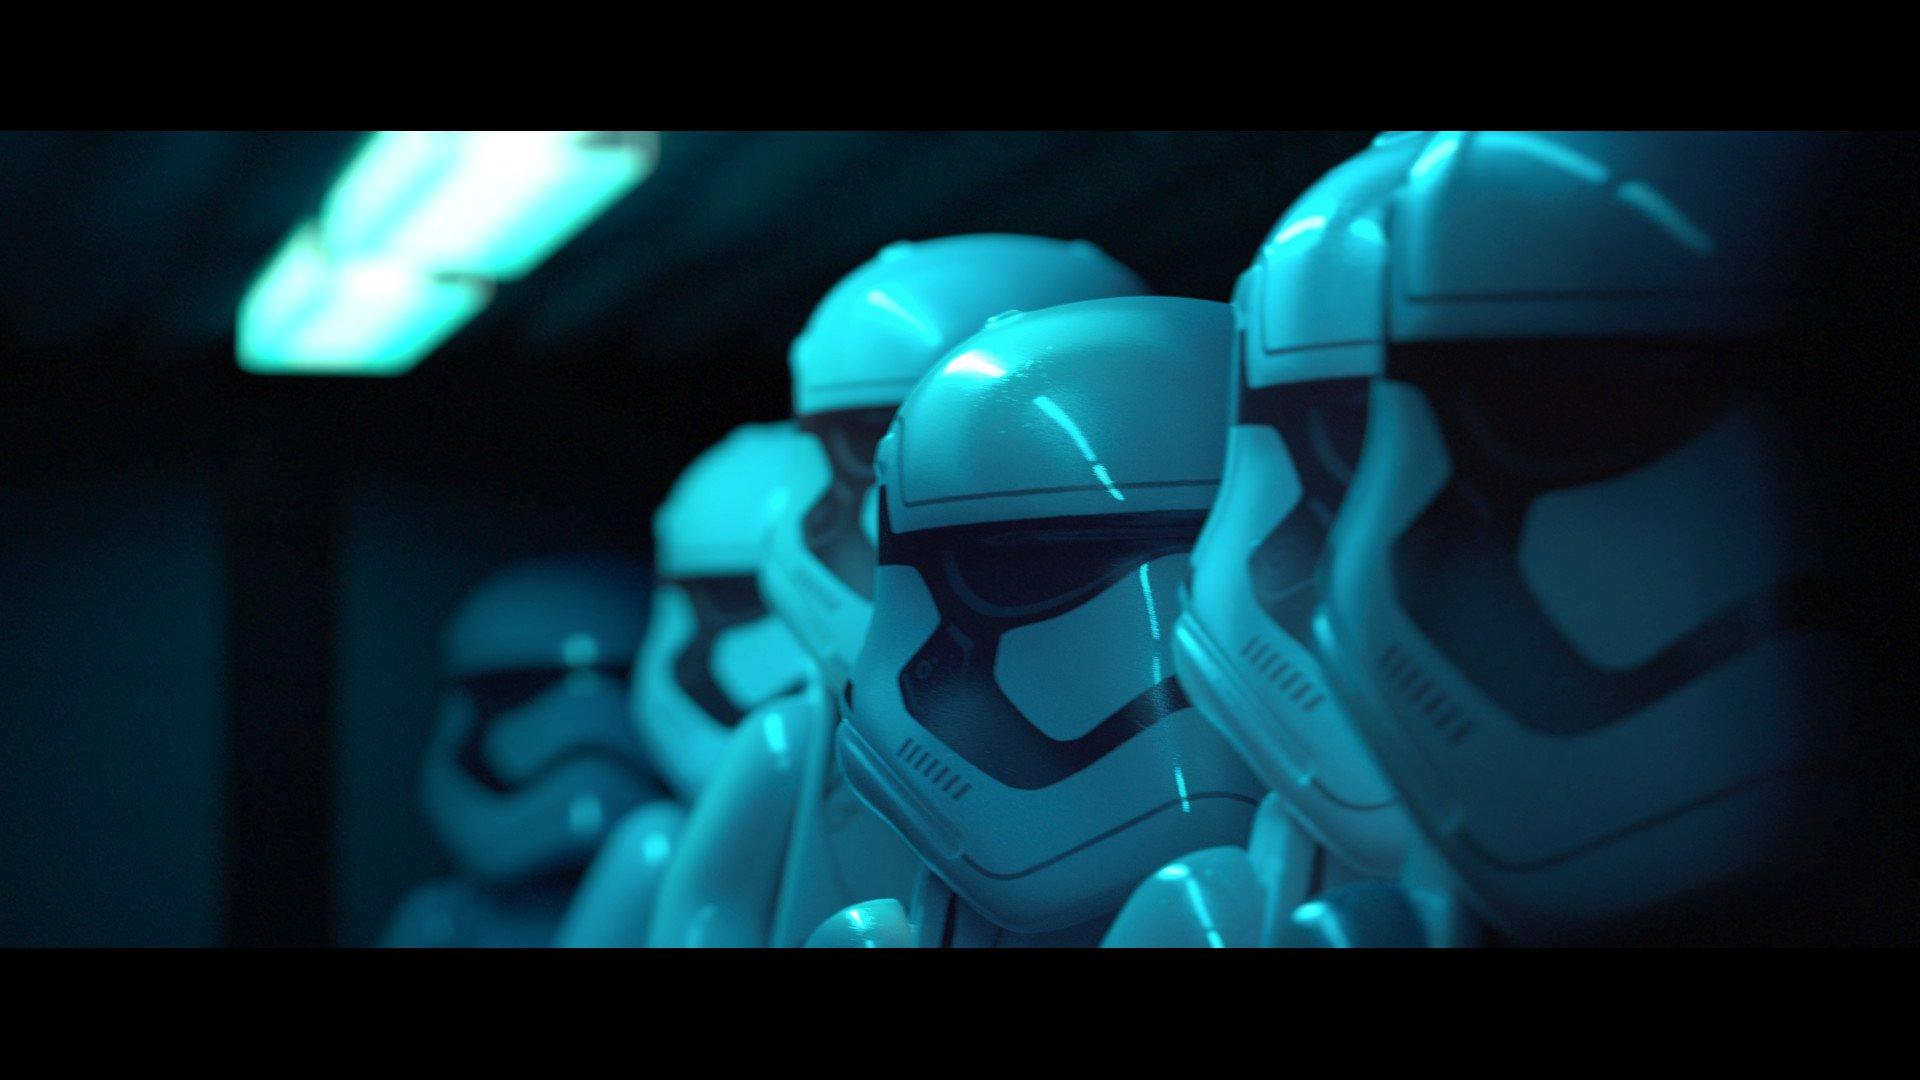 LEGO Star Wars The Force Awakens 11